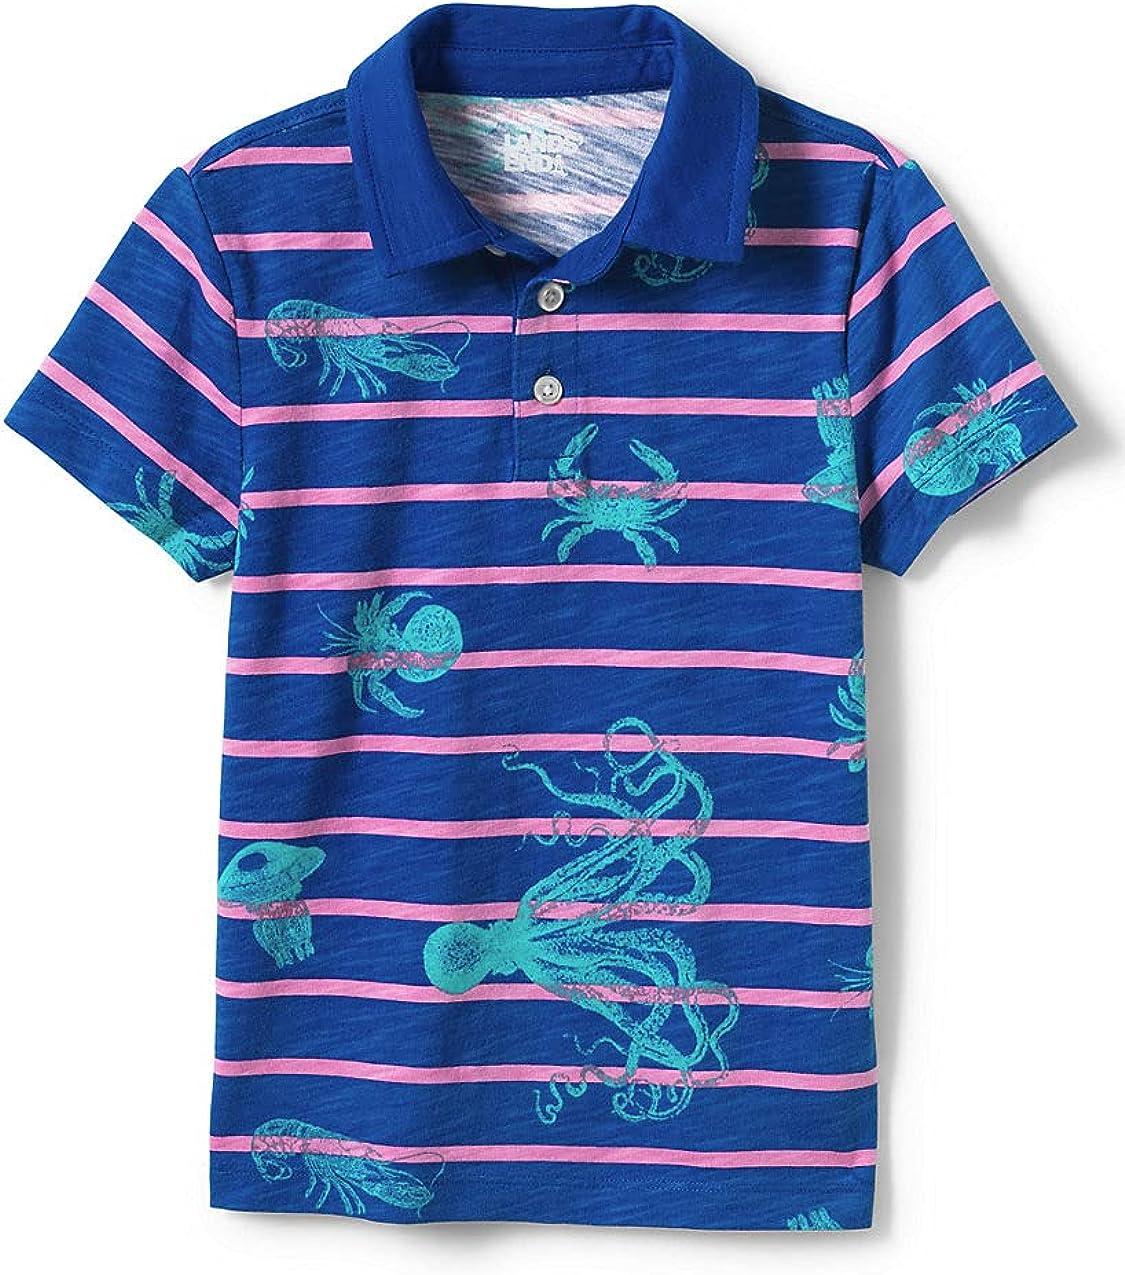 Lands' End Boys Short Sleeve Colorblock Pocket Slub Polo